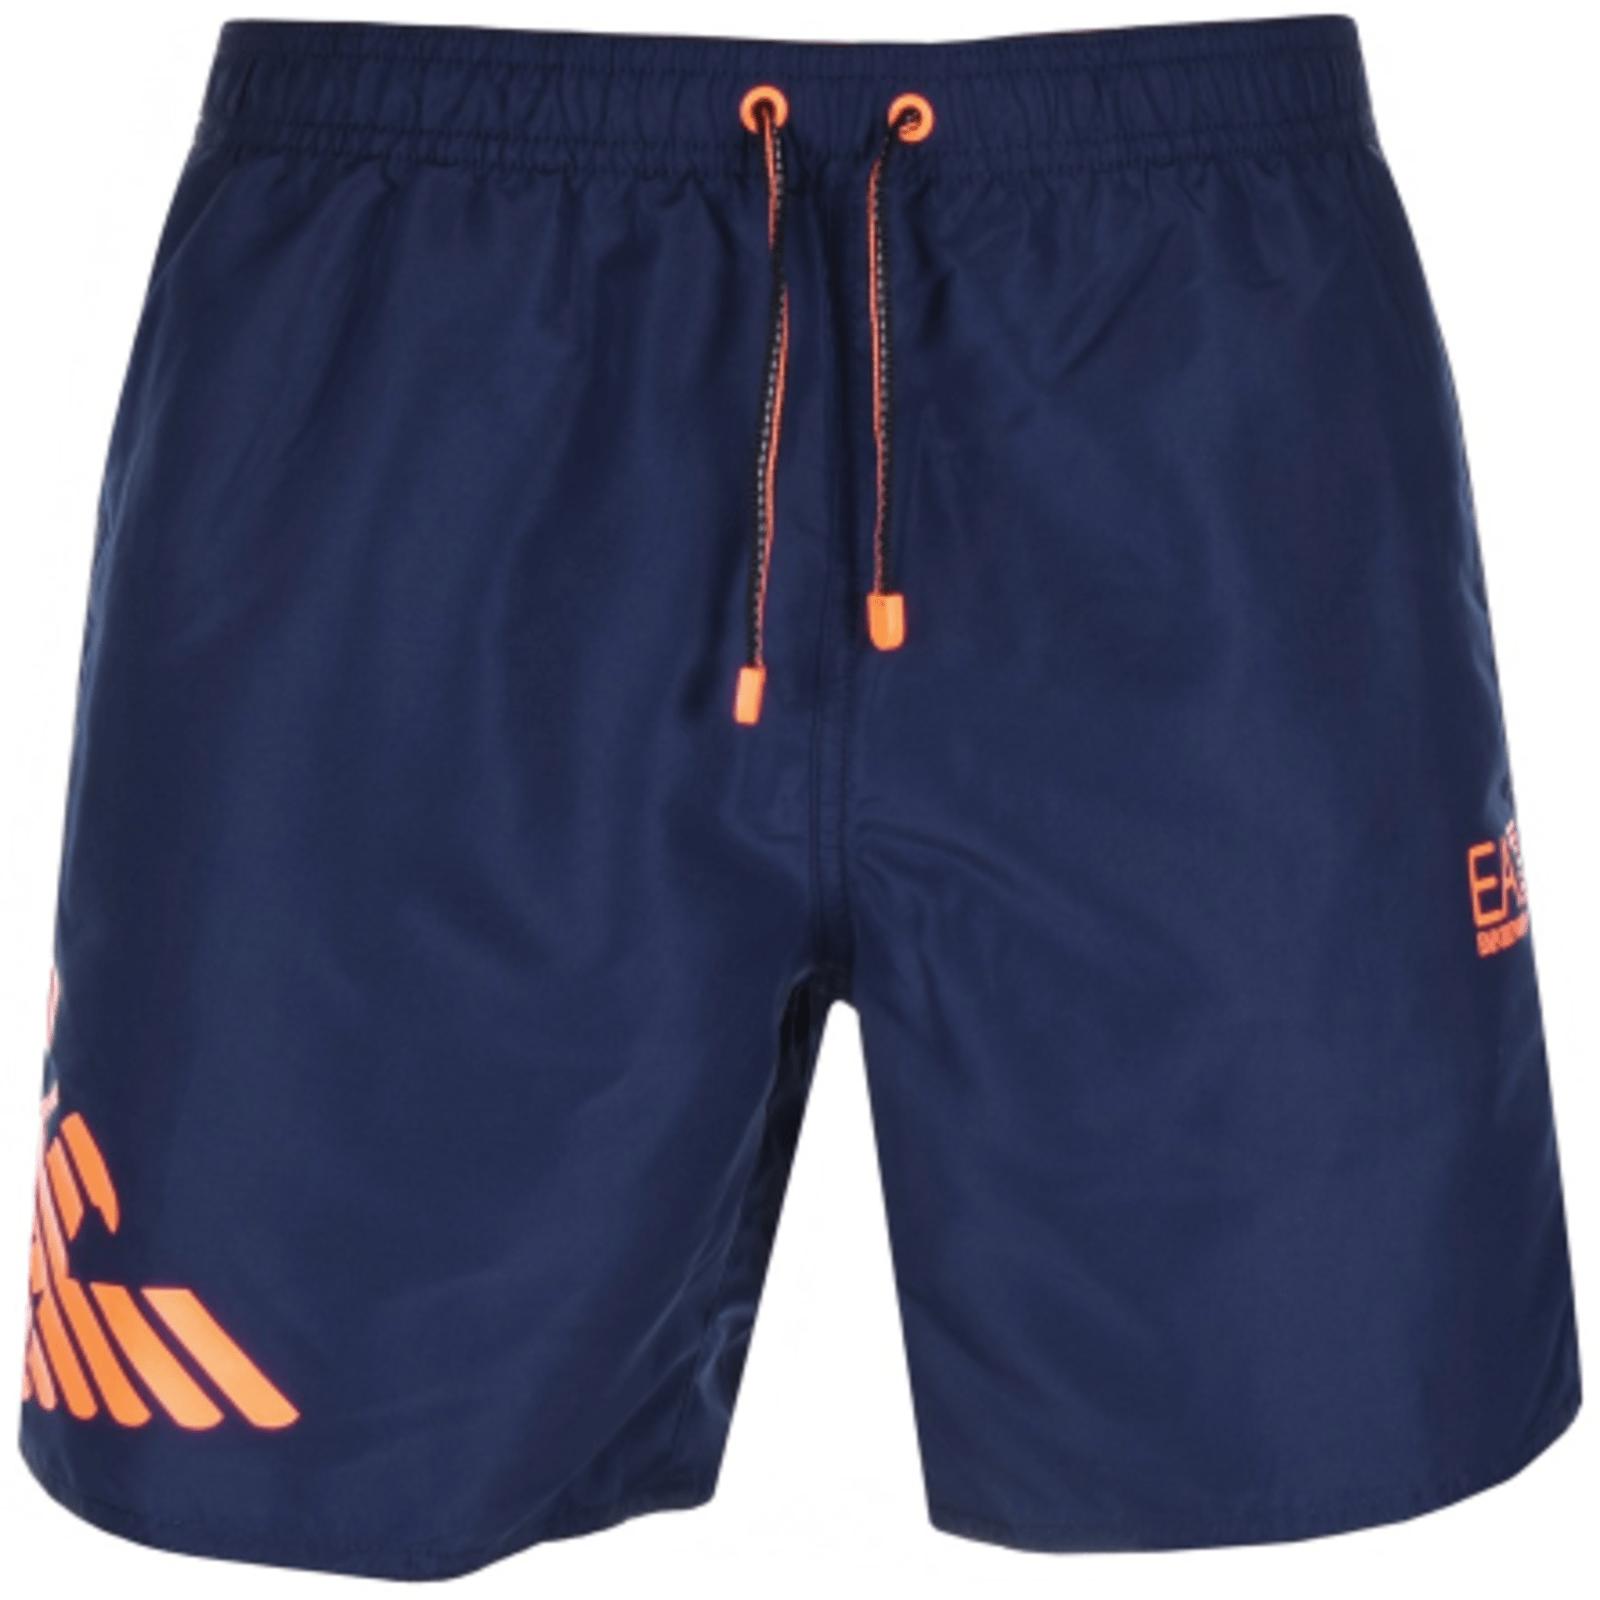 armani zwem shorts ea7